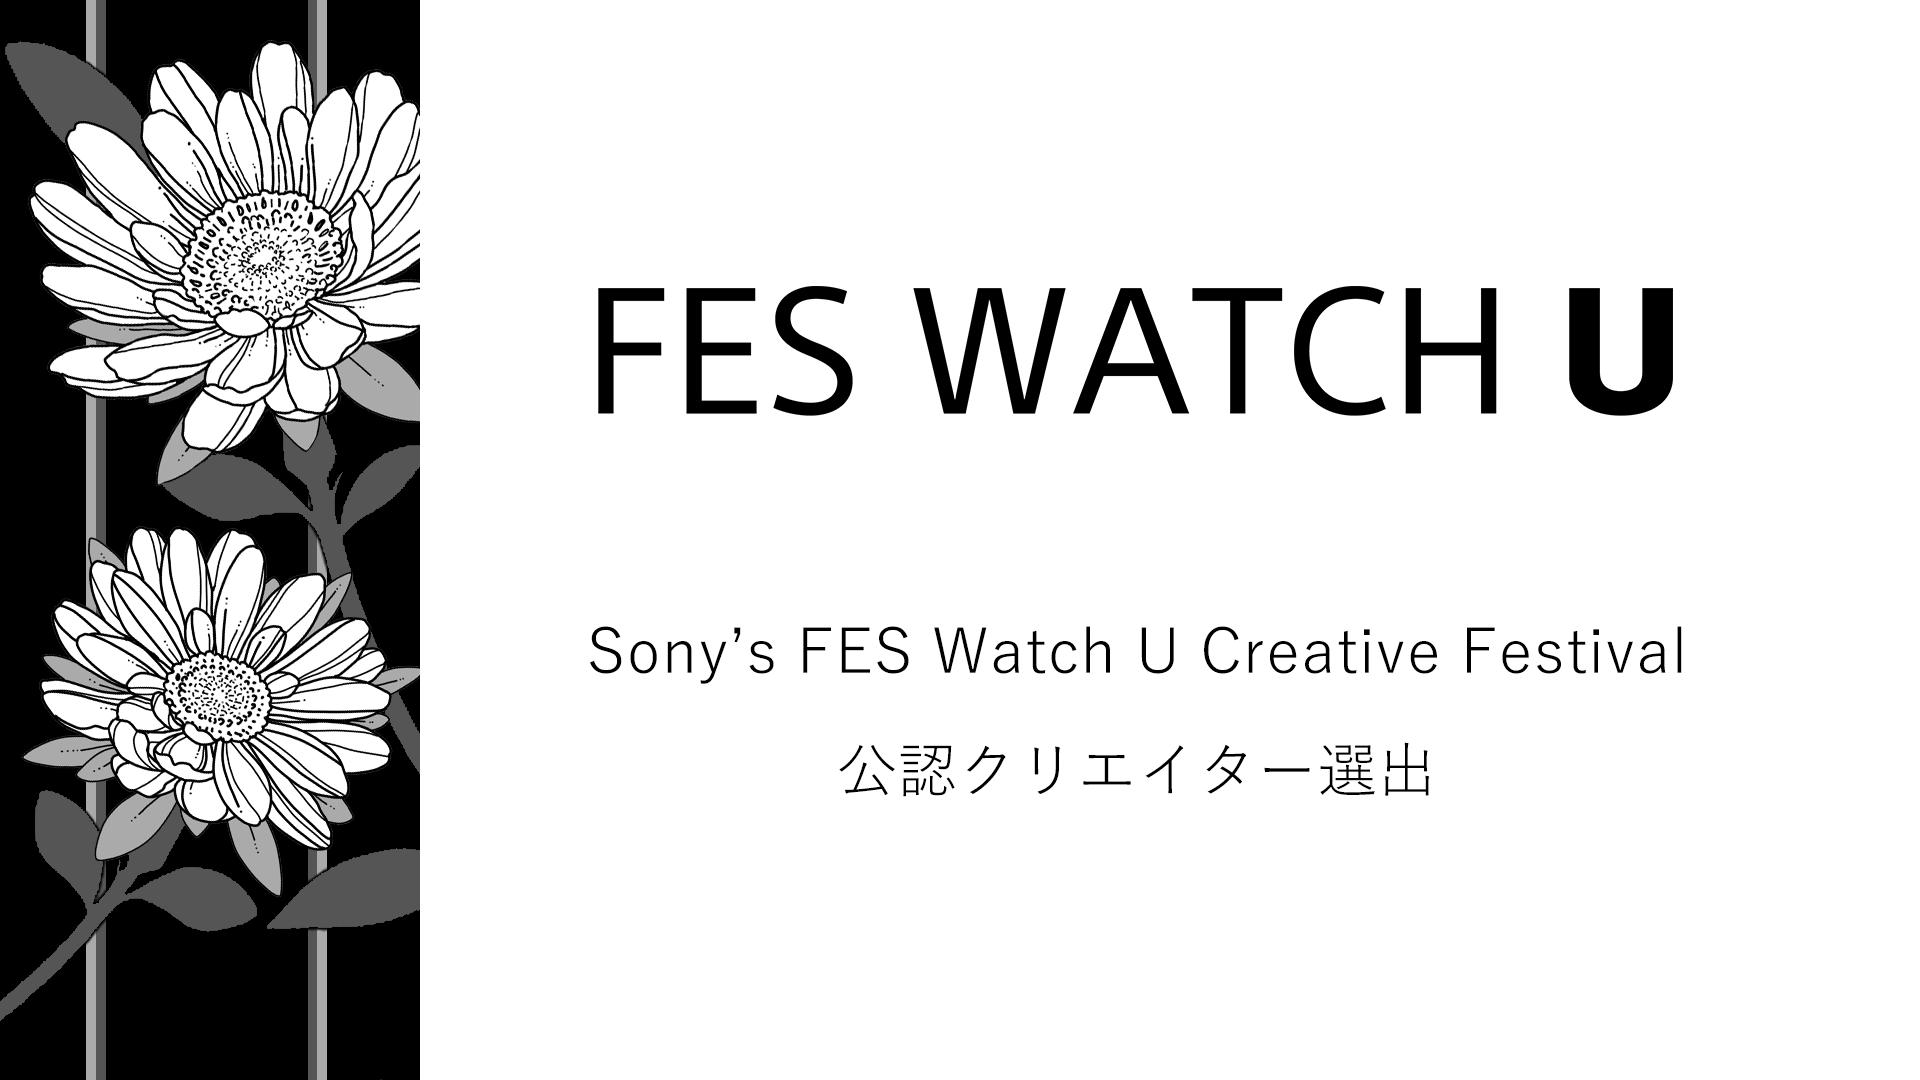 Sony's FES Watch U Creative Festival 公認クリエイターとしてデザイン採用